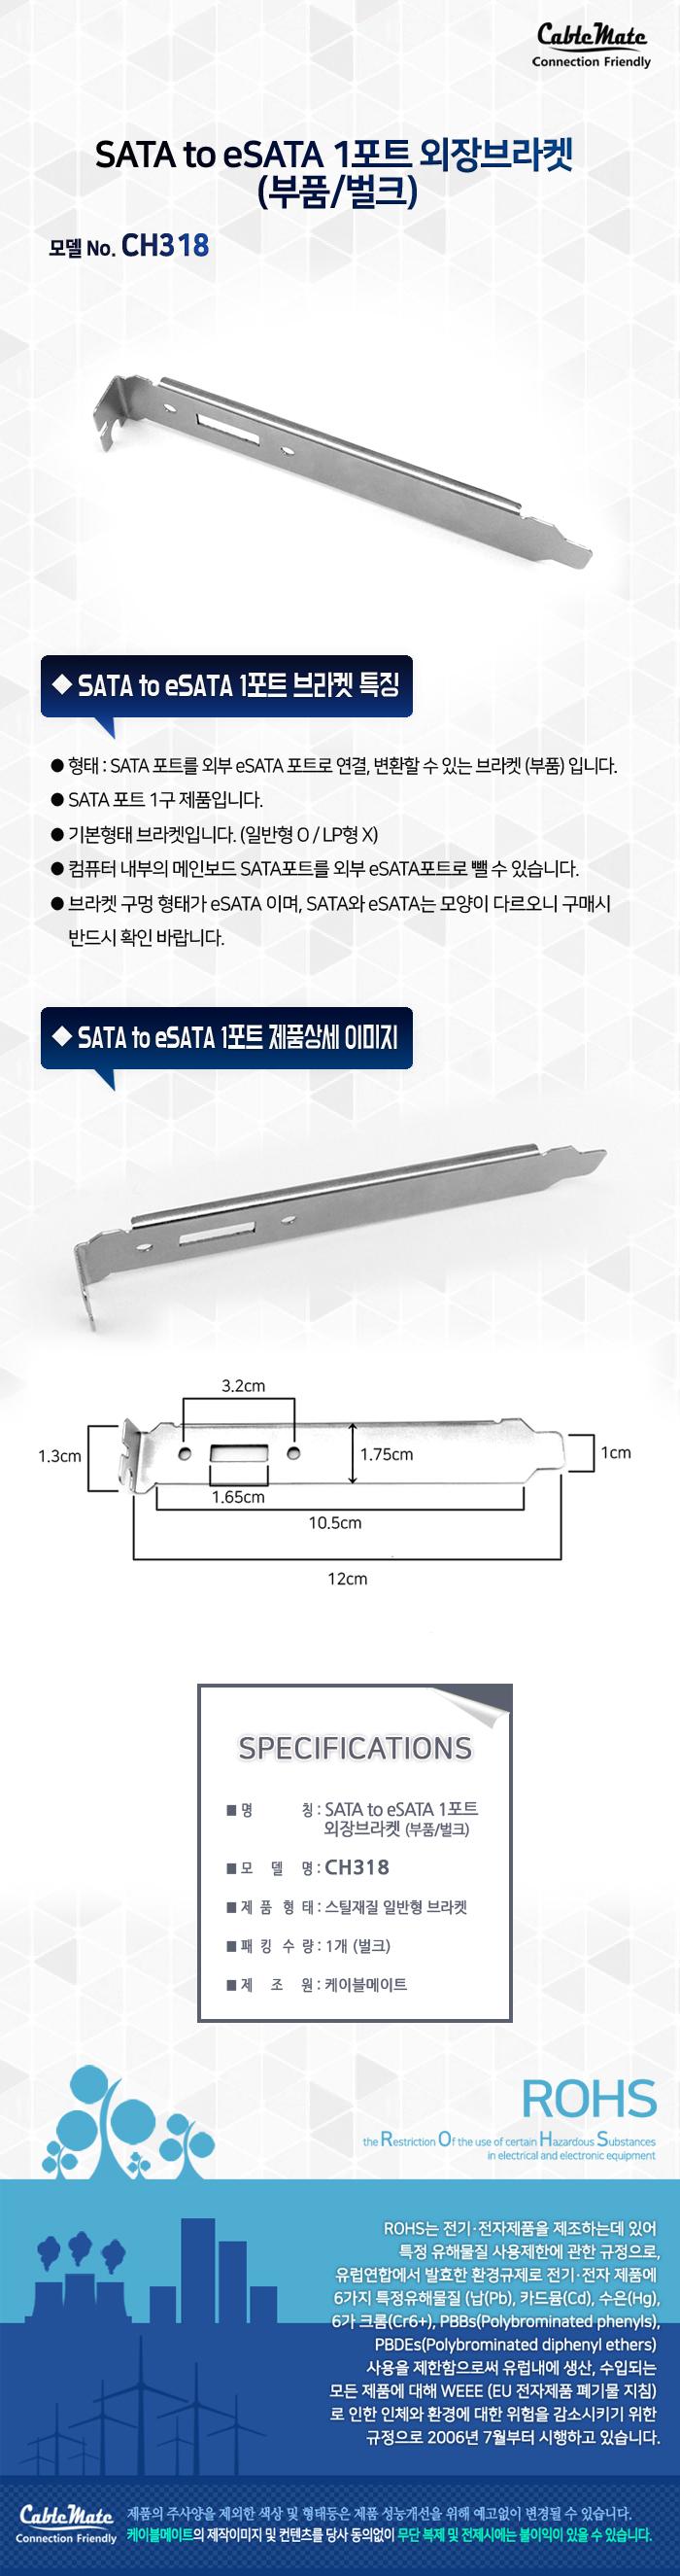 CABLEMATE CH318 SATA to eSATA 1포트 외장브라켓 (벌크)